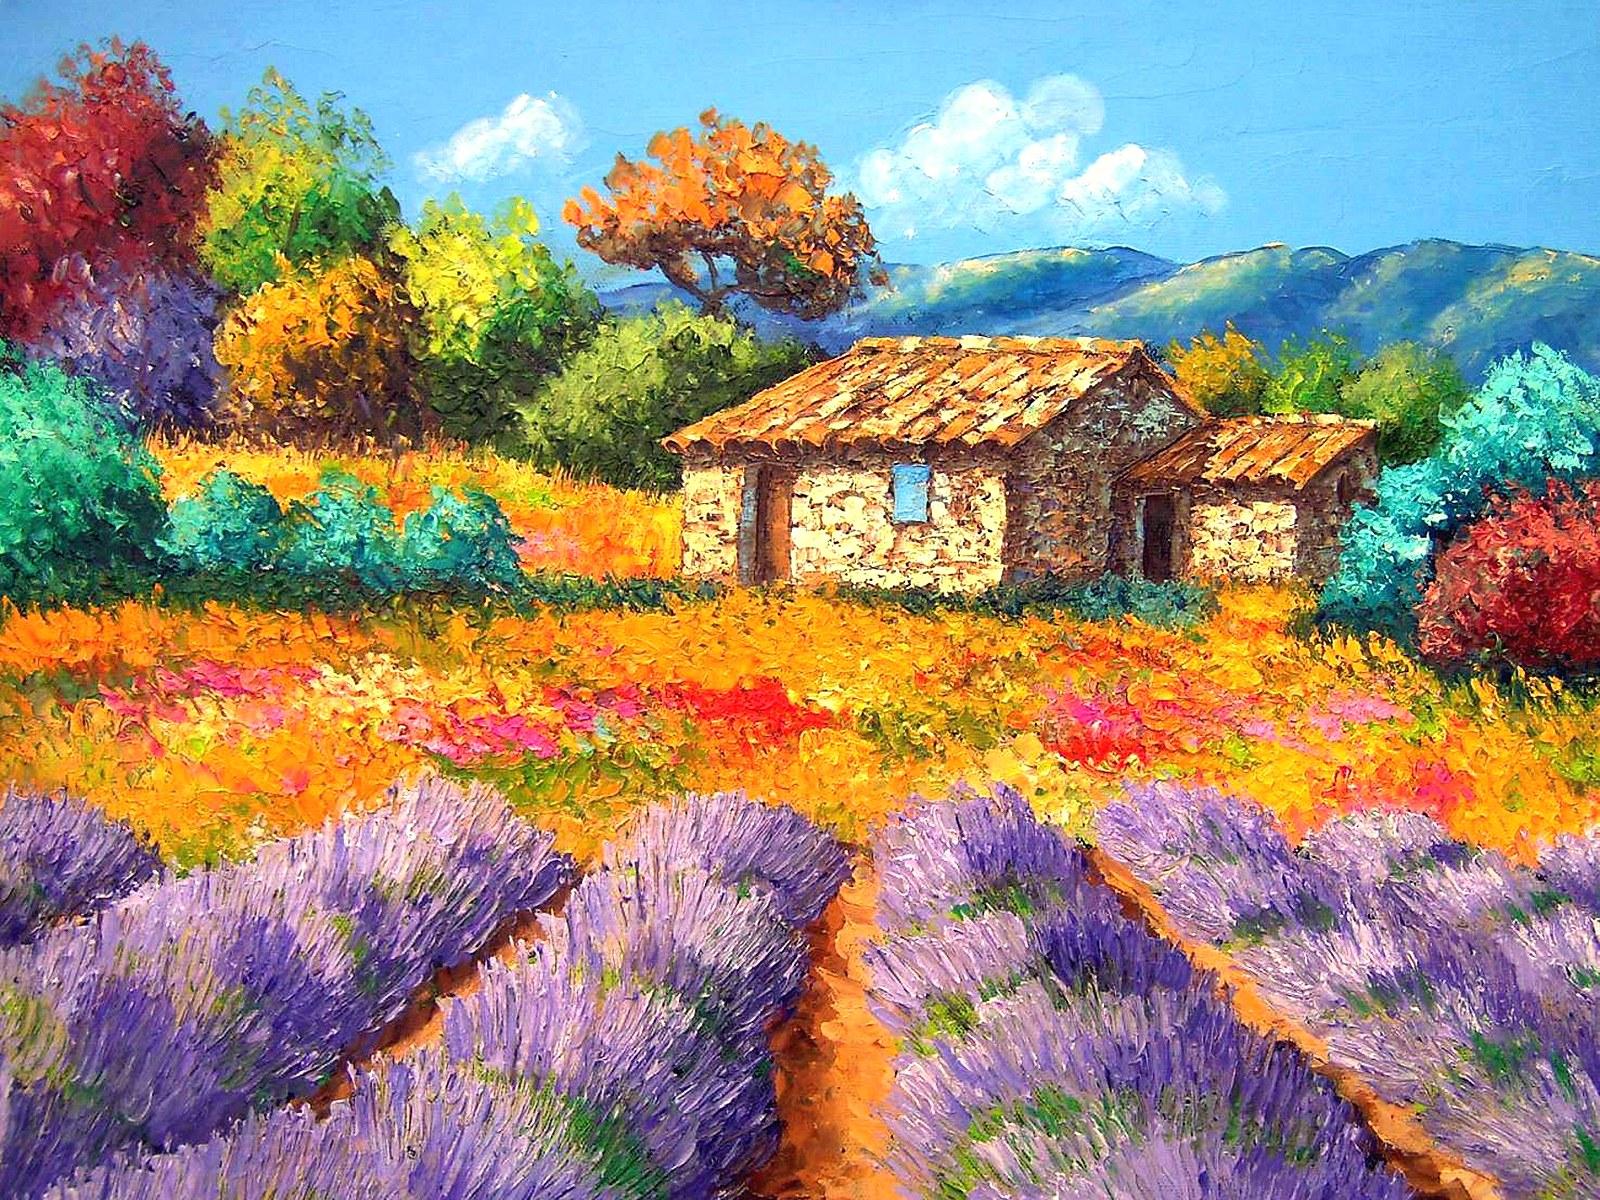 Indian Wallpaper Hub: 3D Beautiful Painting HD Wallpapers ...